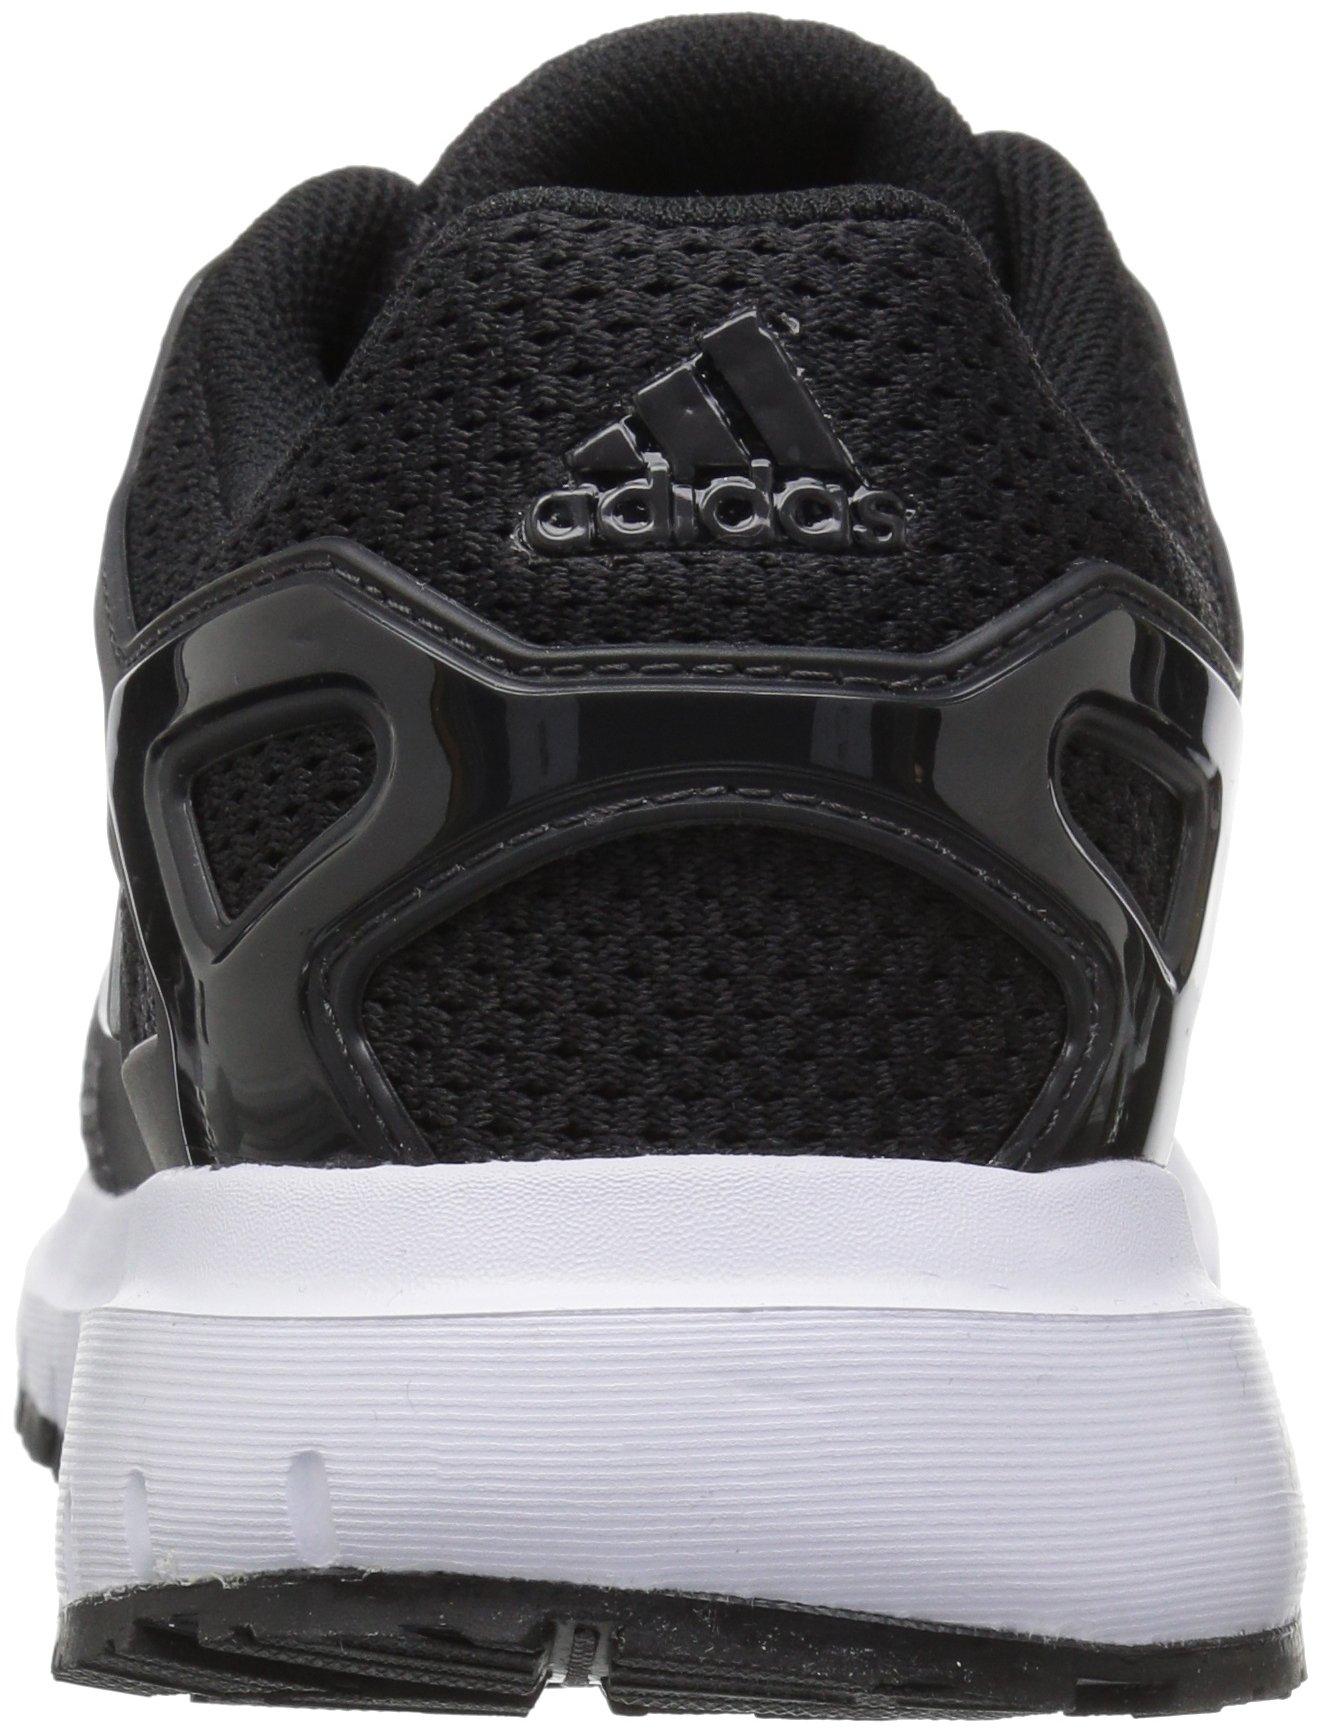 adidas  Men's Energy Cloud Wide m Running Shoe, BLACK/UTILITY BLACK/WHITE, 10.5 2E US by adidas (Image #2)